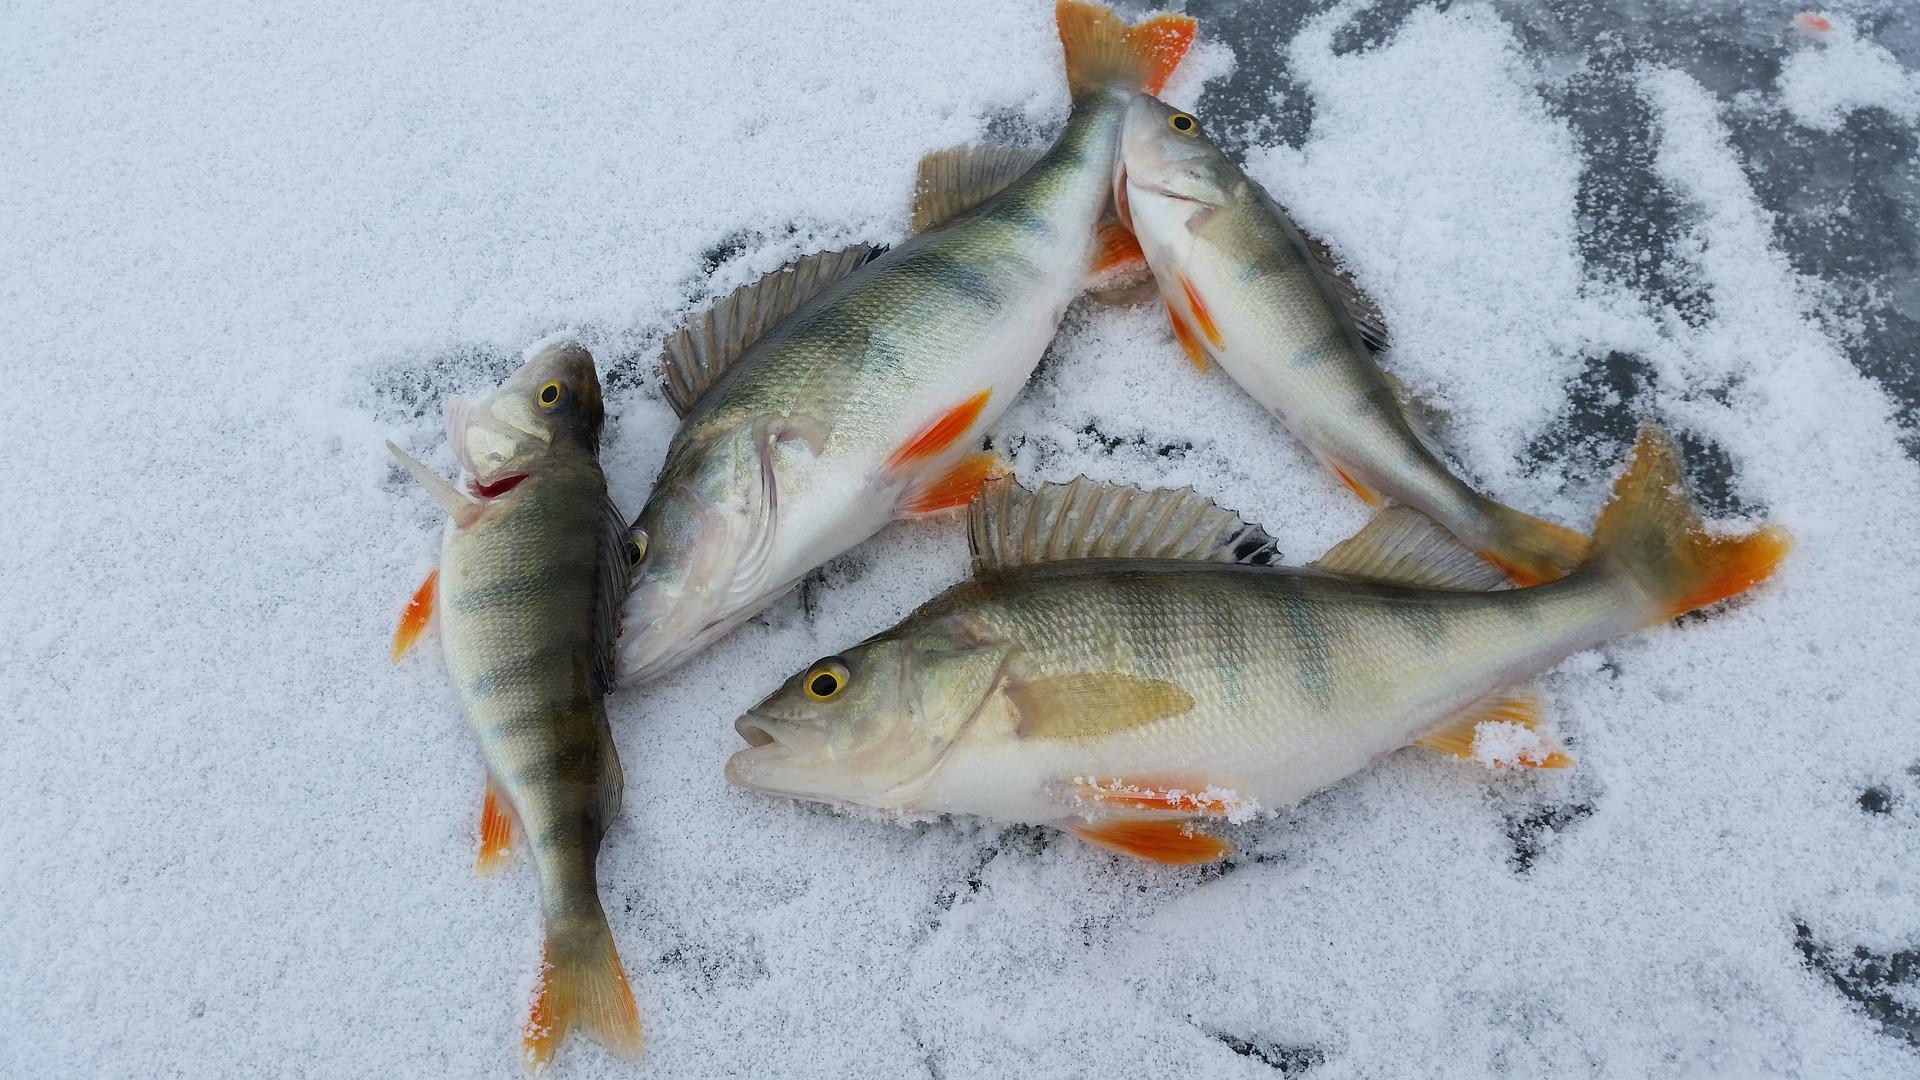 ice-fishing-2919070_1920